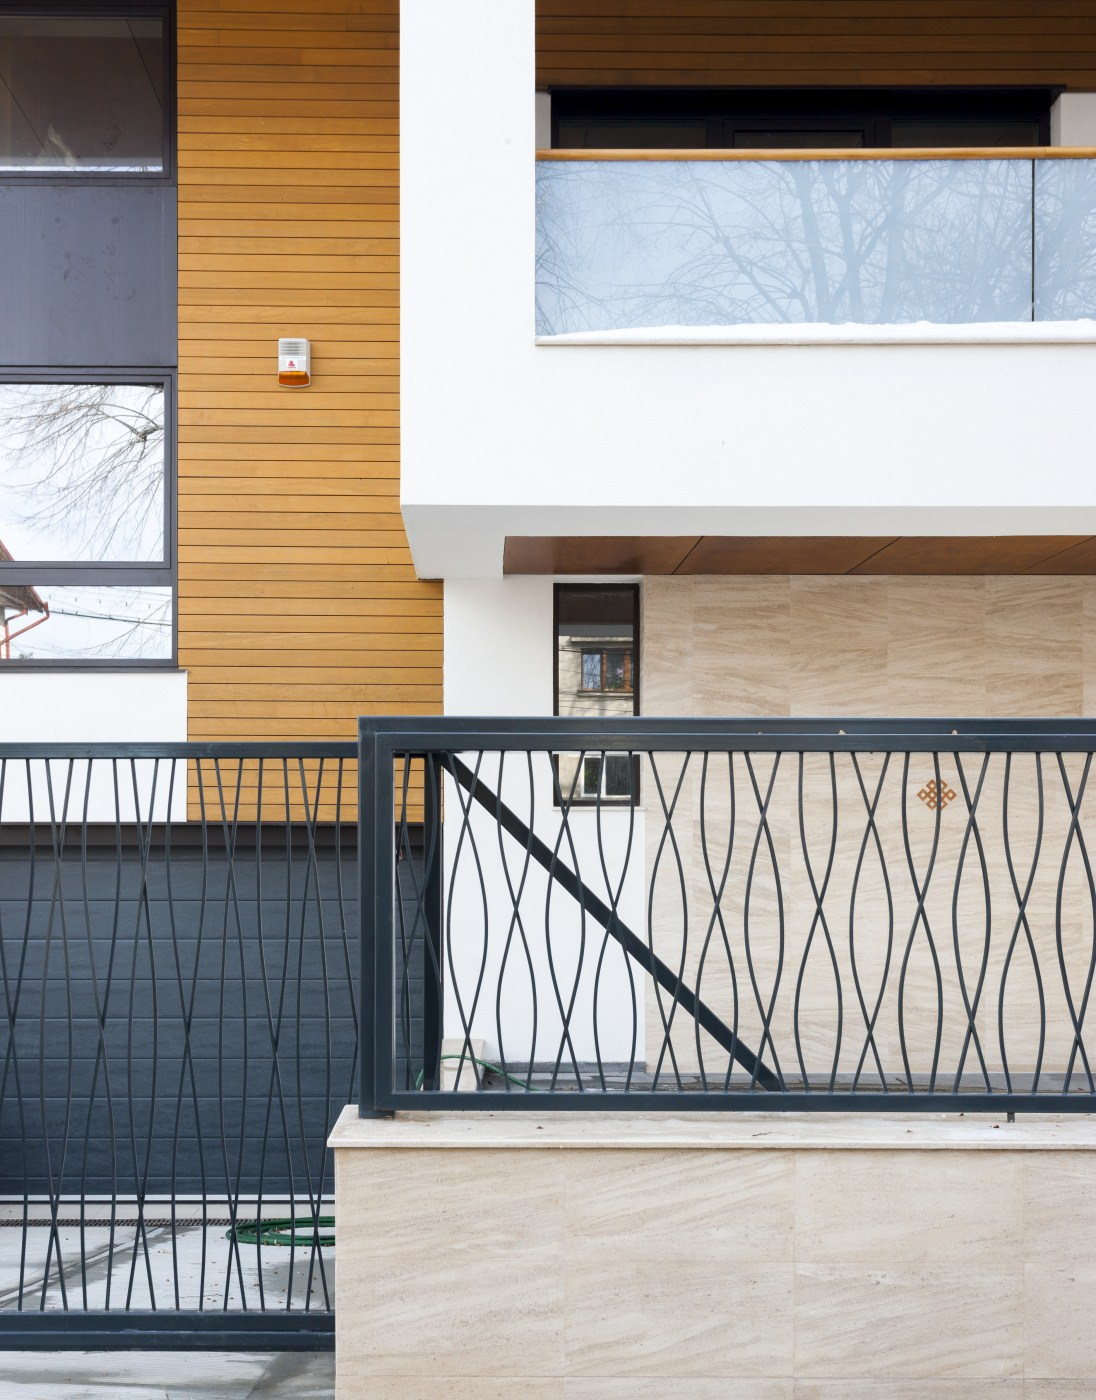 https://nbc-arhitect.ro/wp-content/uploads/2020/10/NBC-ARHITECT-_-housing-_-Sandu-Aldea-House-Villa-_-exterior-view_1.jpg